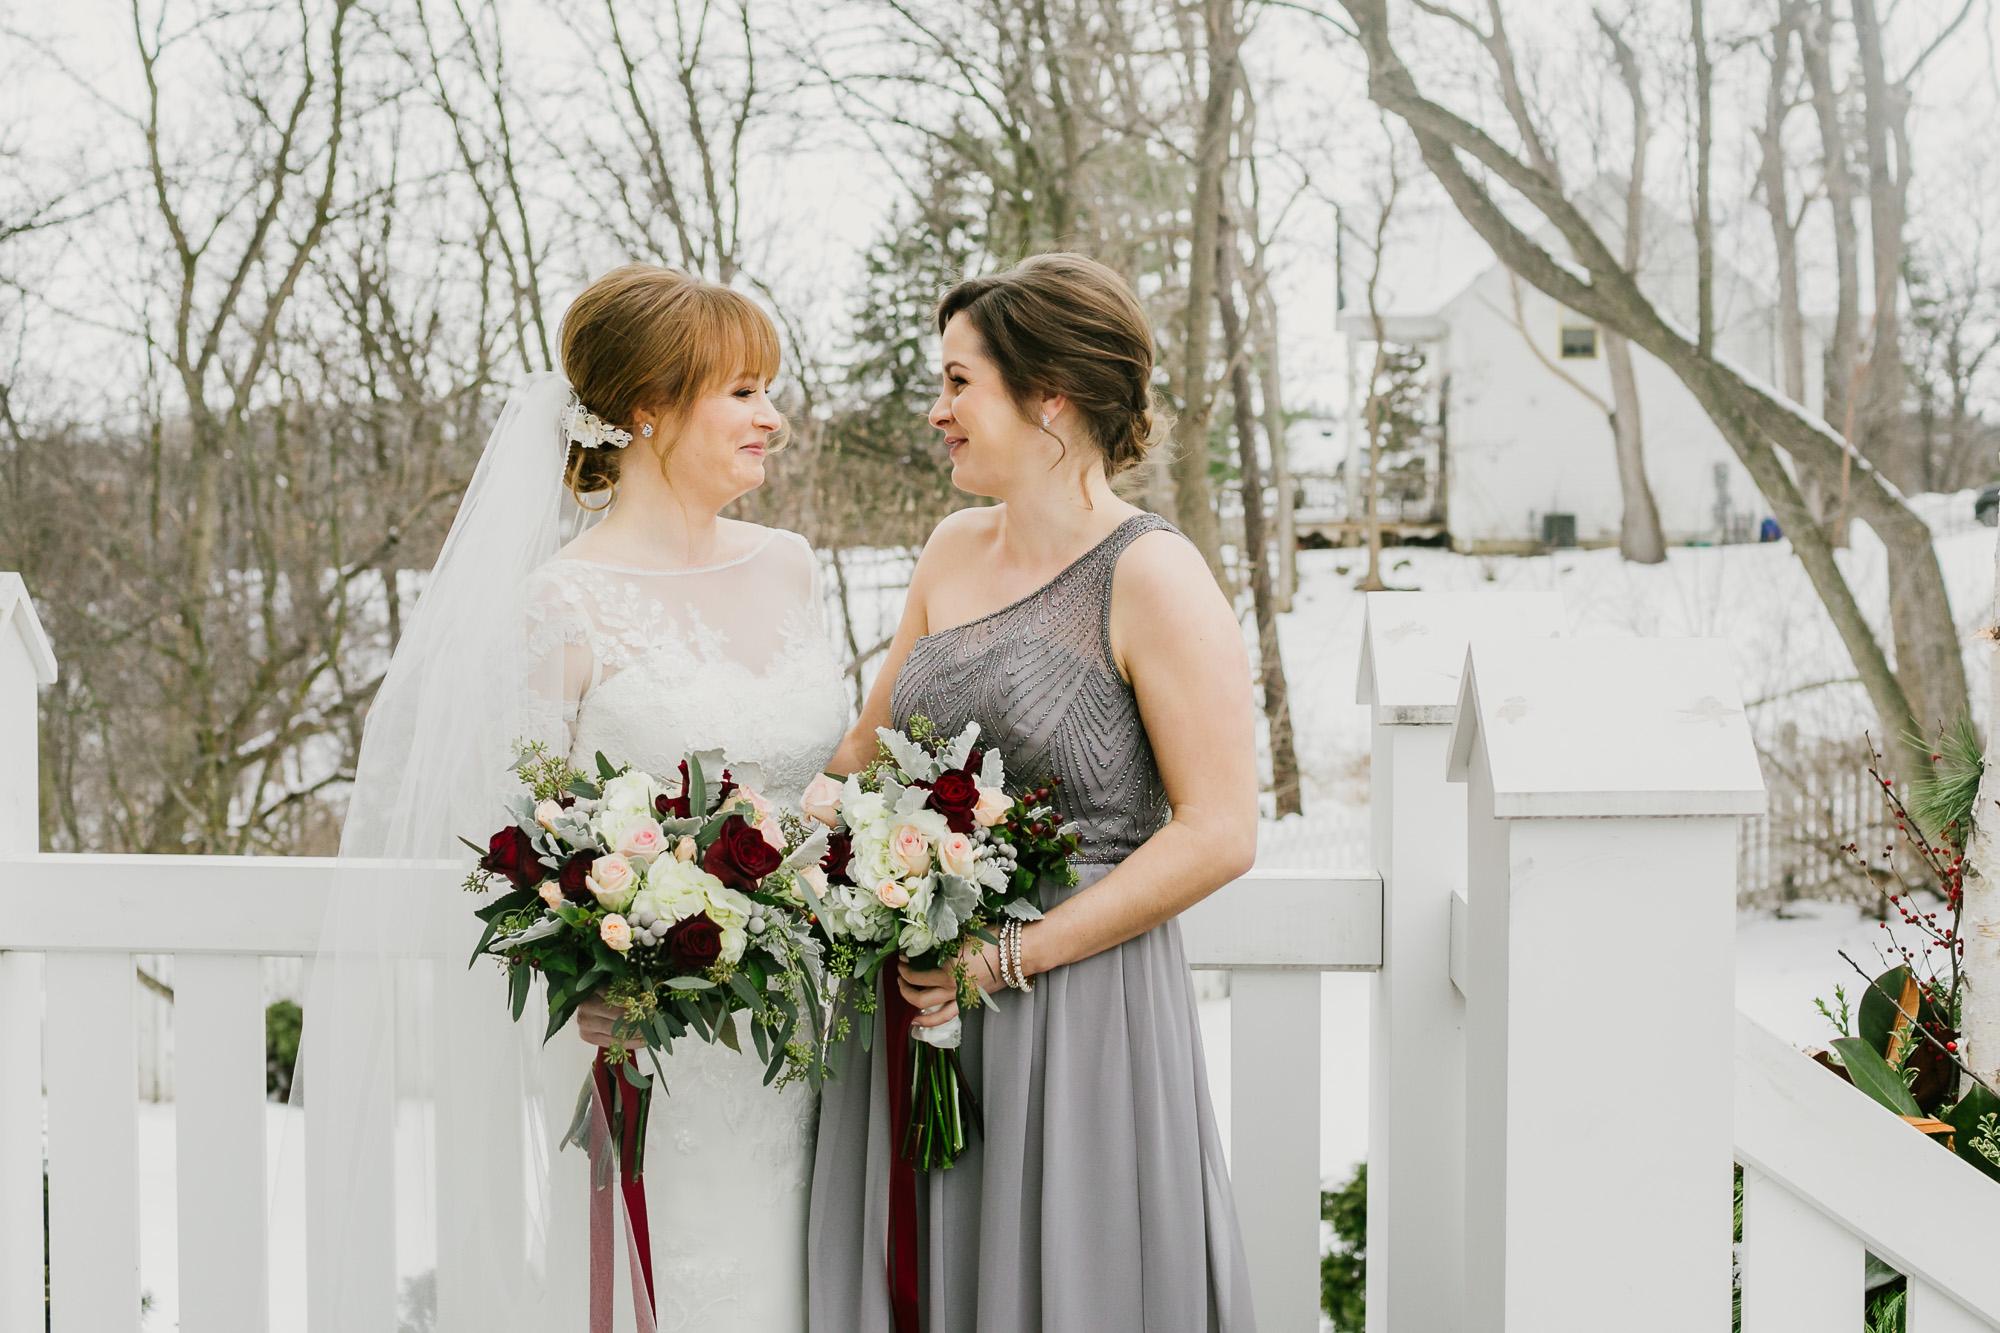 Doctor's House Winter Wedding Portraits -68.jpg